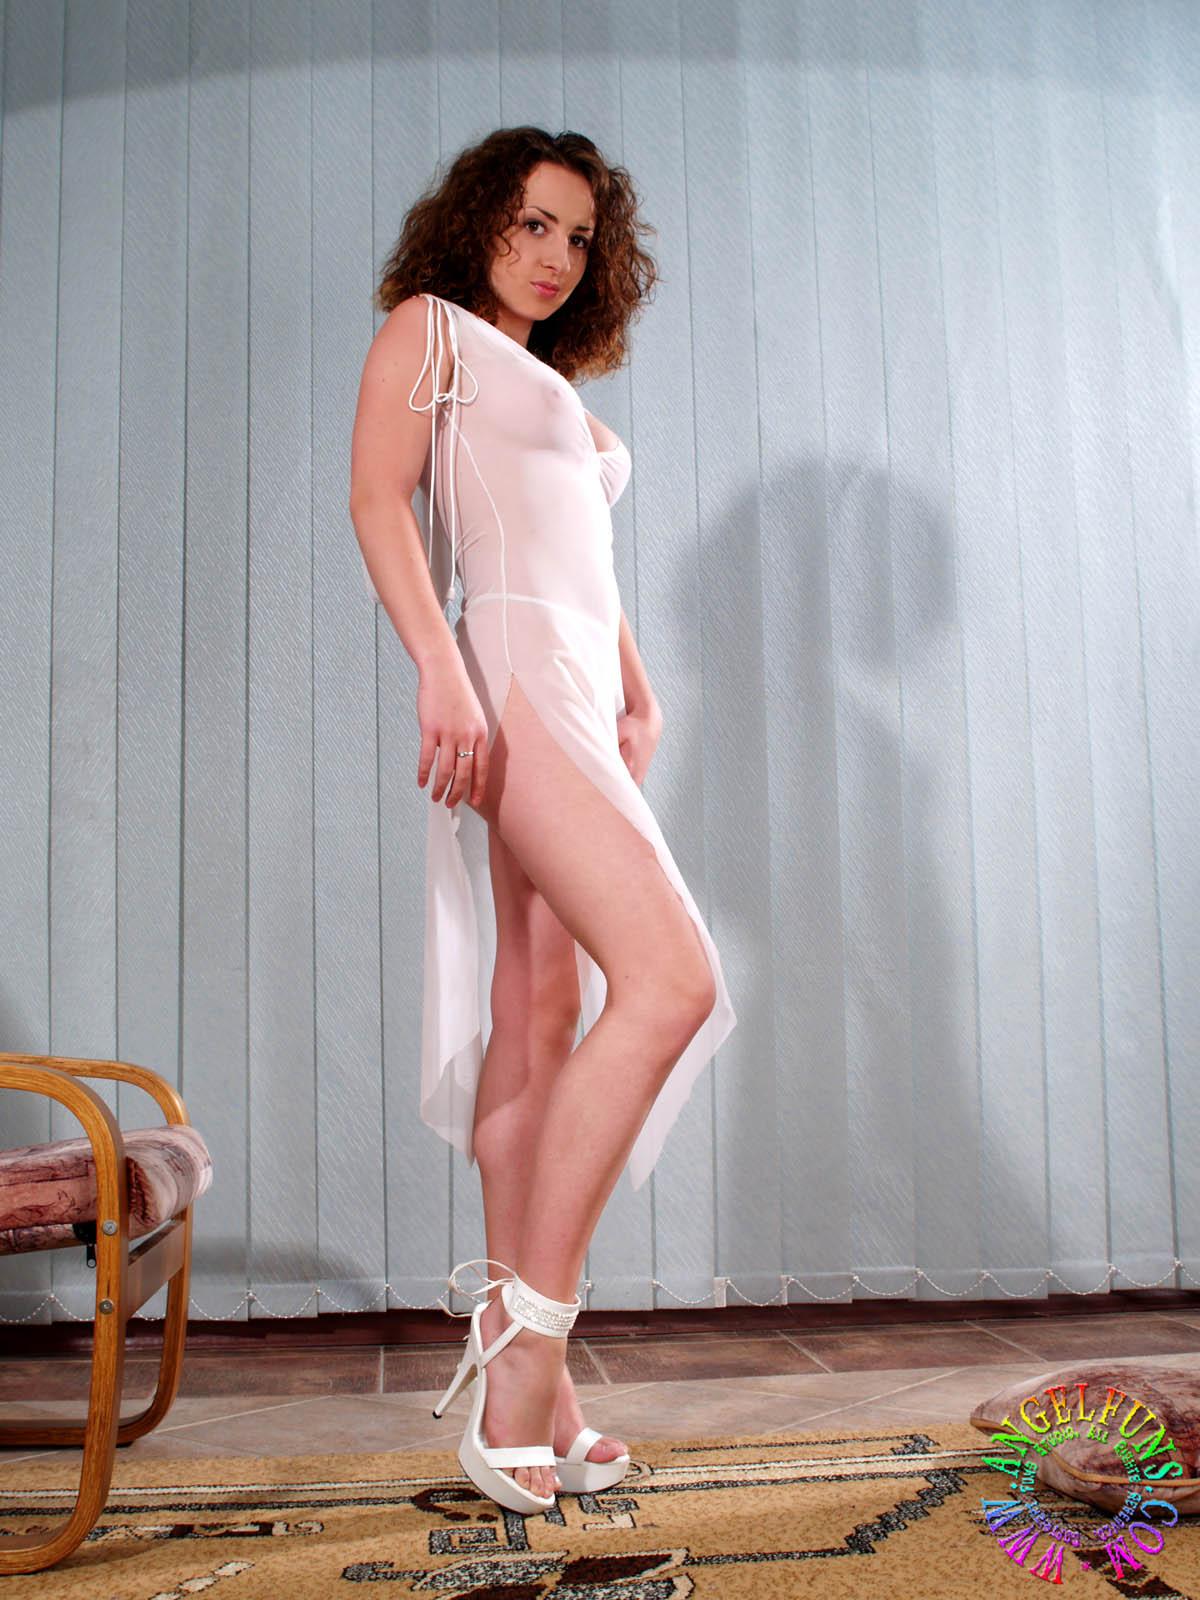 Julie - 021 - Pics